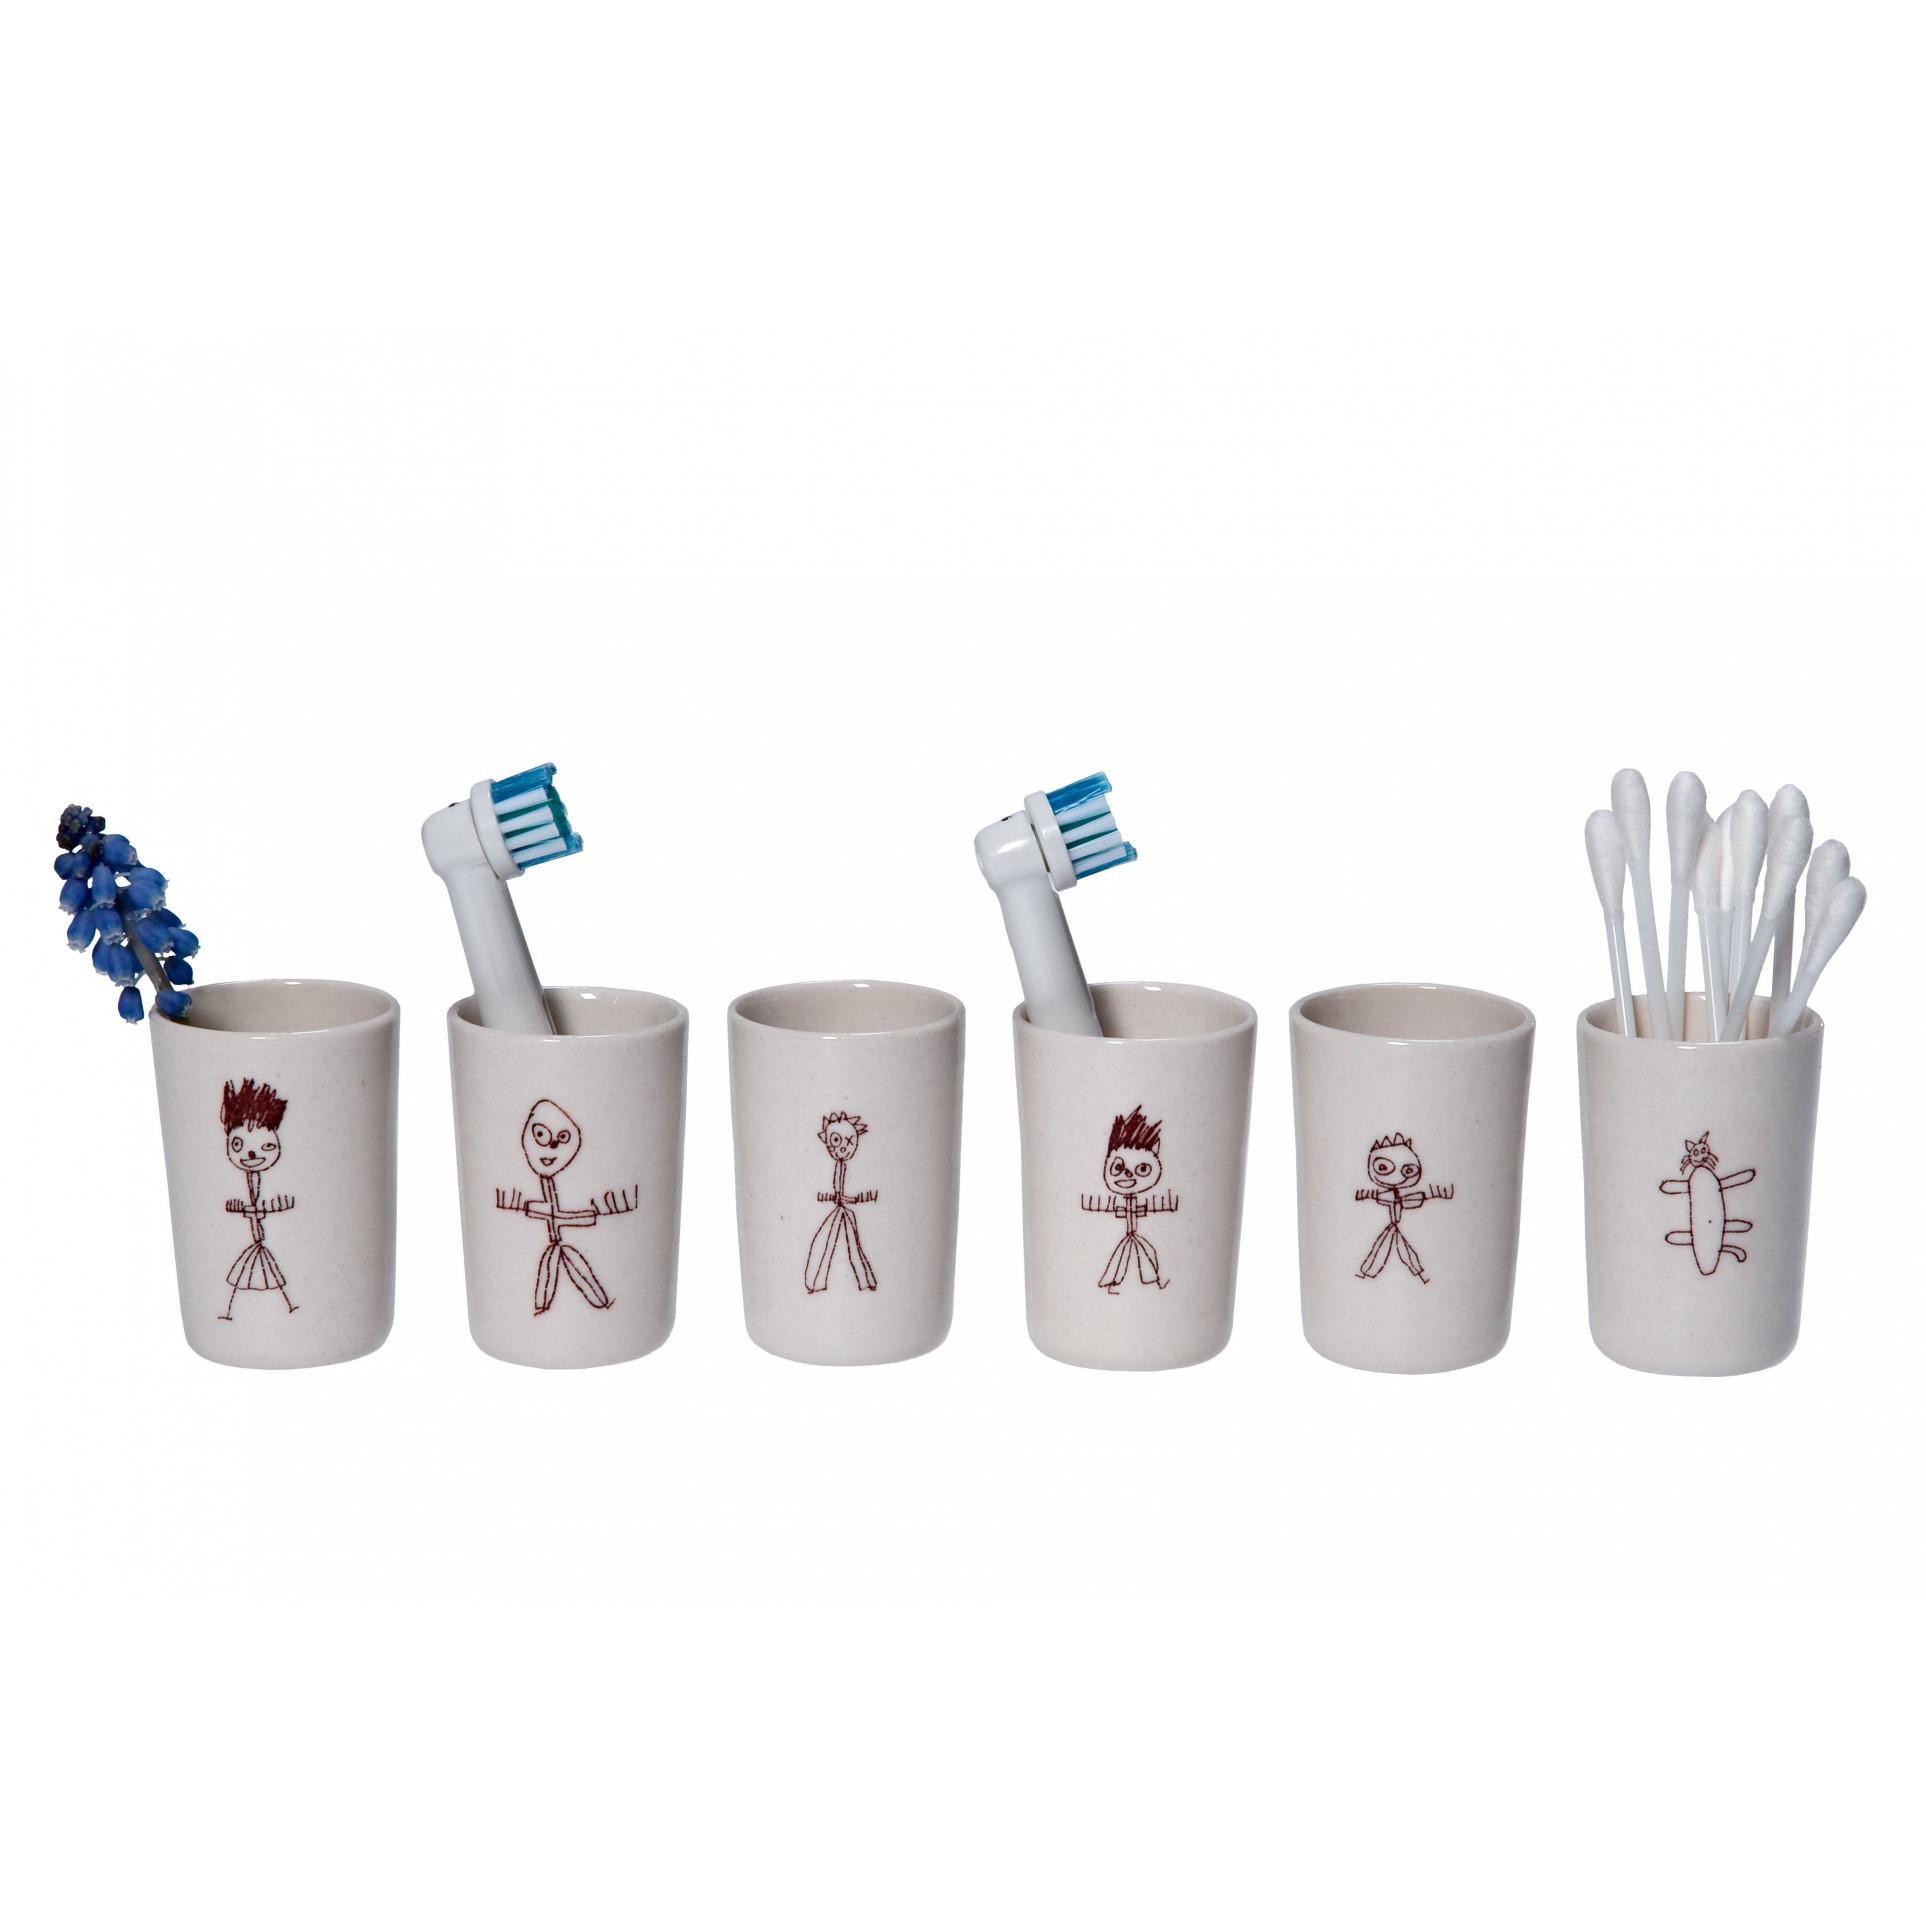 Electric Tootbrush Vases Bertram Family Part II